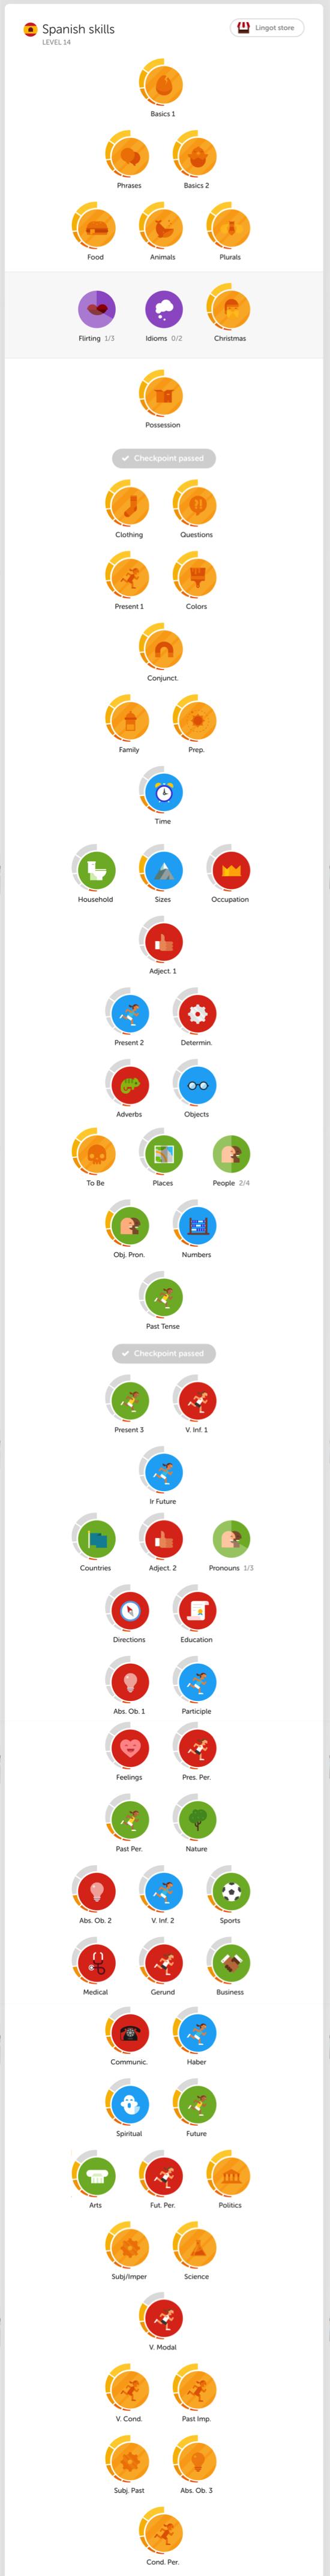 Duolingo Total 2015-12-21